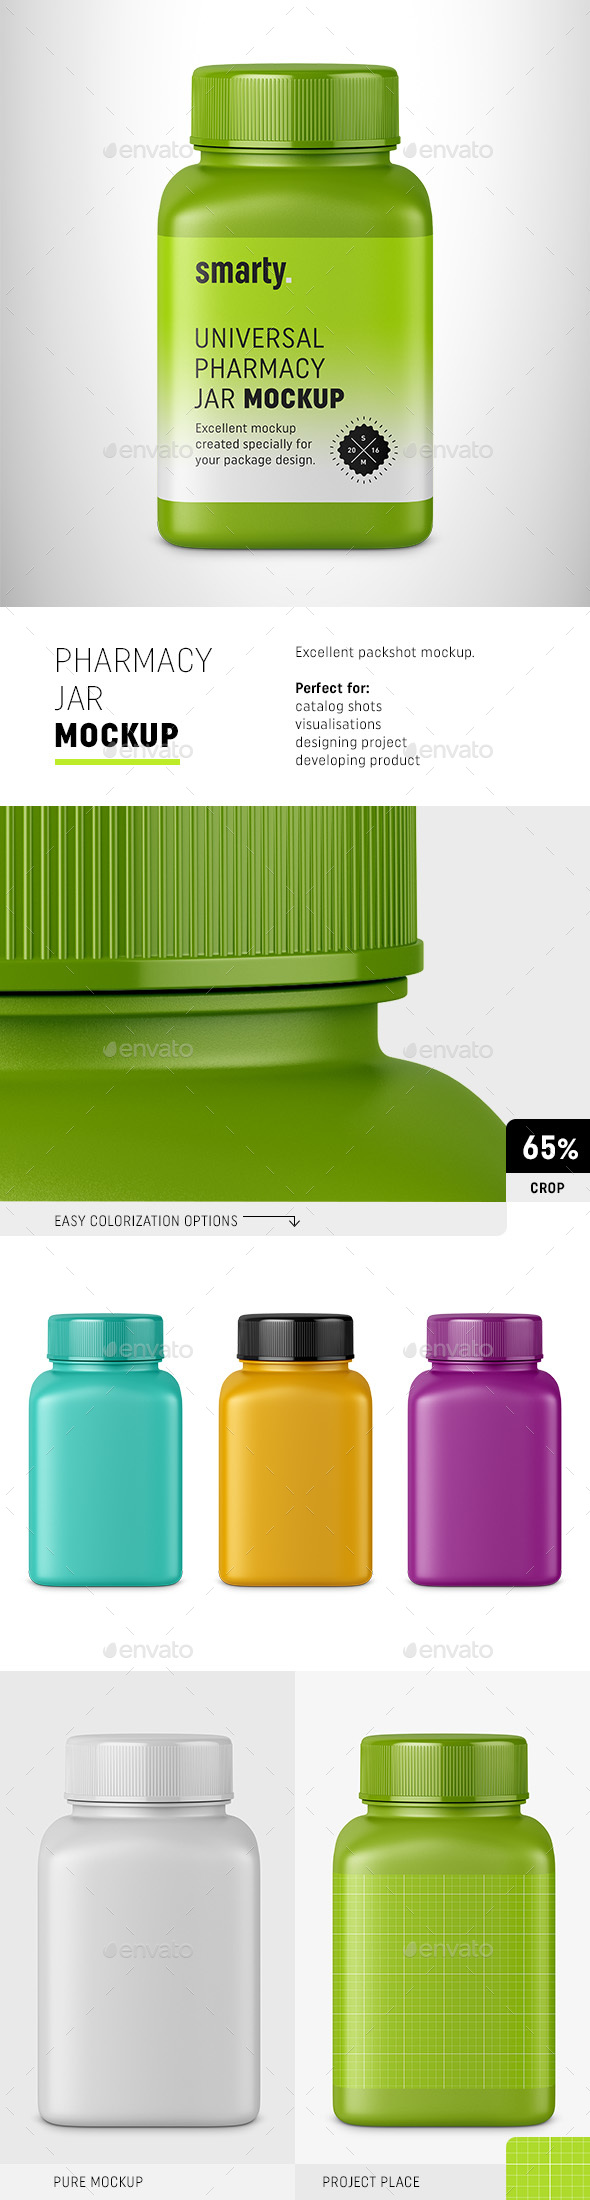 Pharmacy Jar Mockup - Packaging Product Mock-Ups